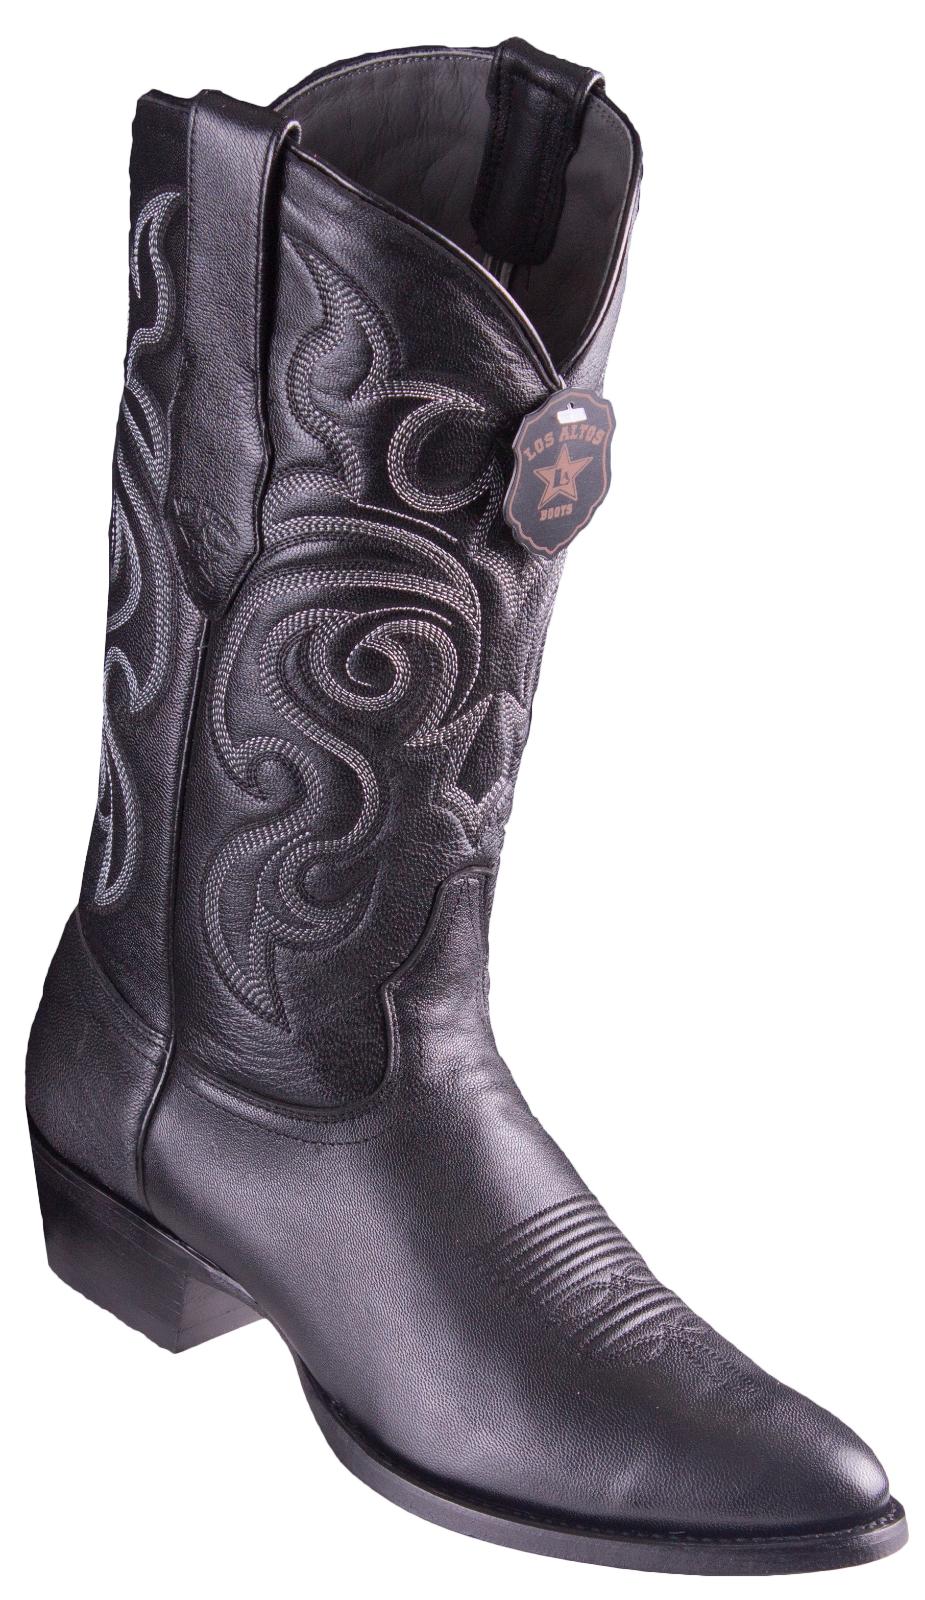 Men's Los Altos Genuine Goat Leather Western Cowboy stivali Round Toe Handmade